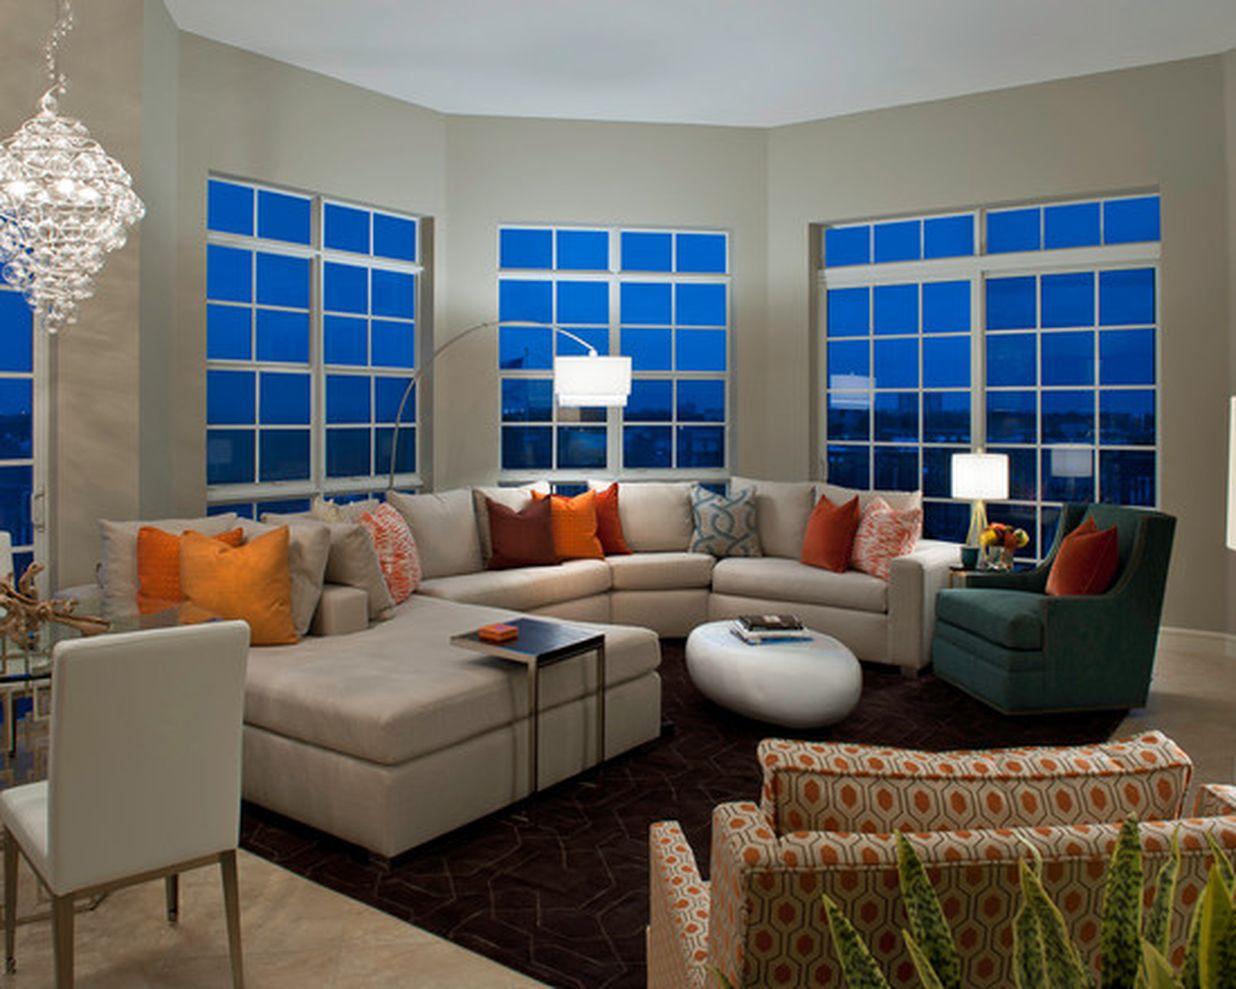 Adorable burnt orange and teal living room ideas 33 - Orange and teal decor ...